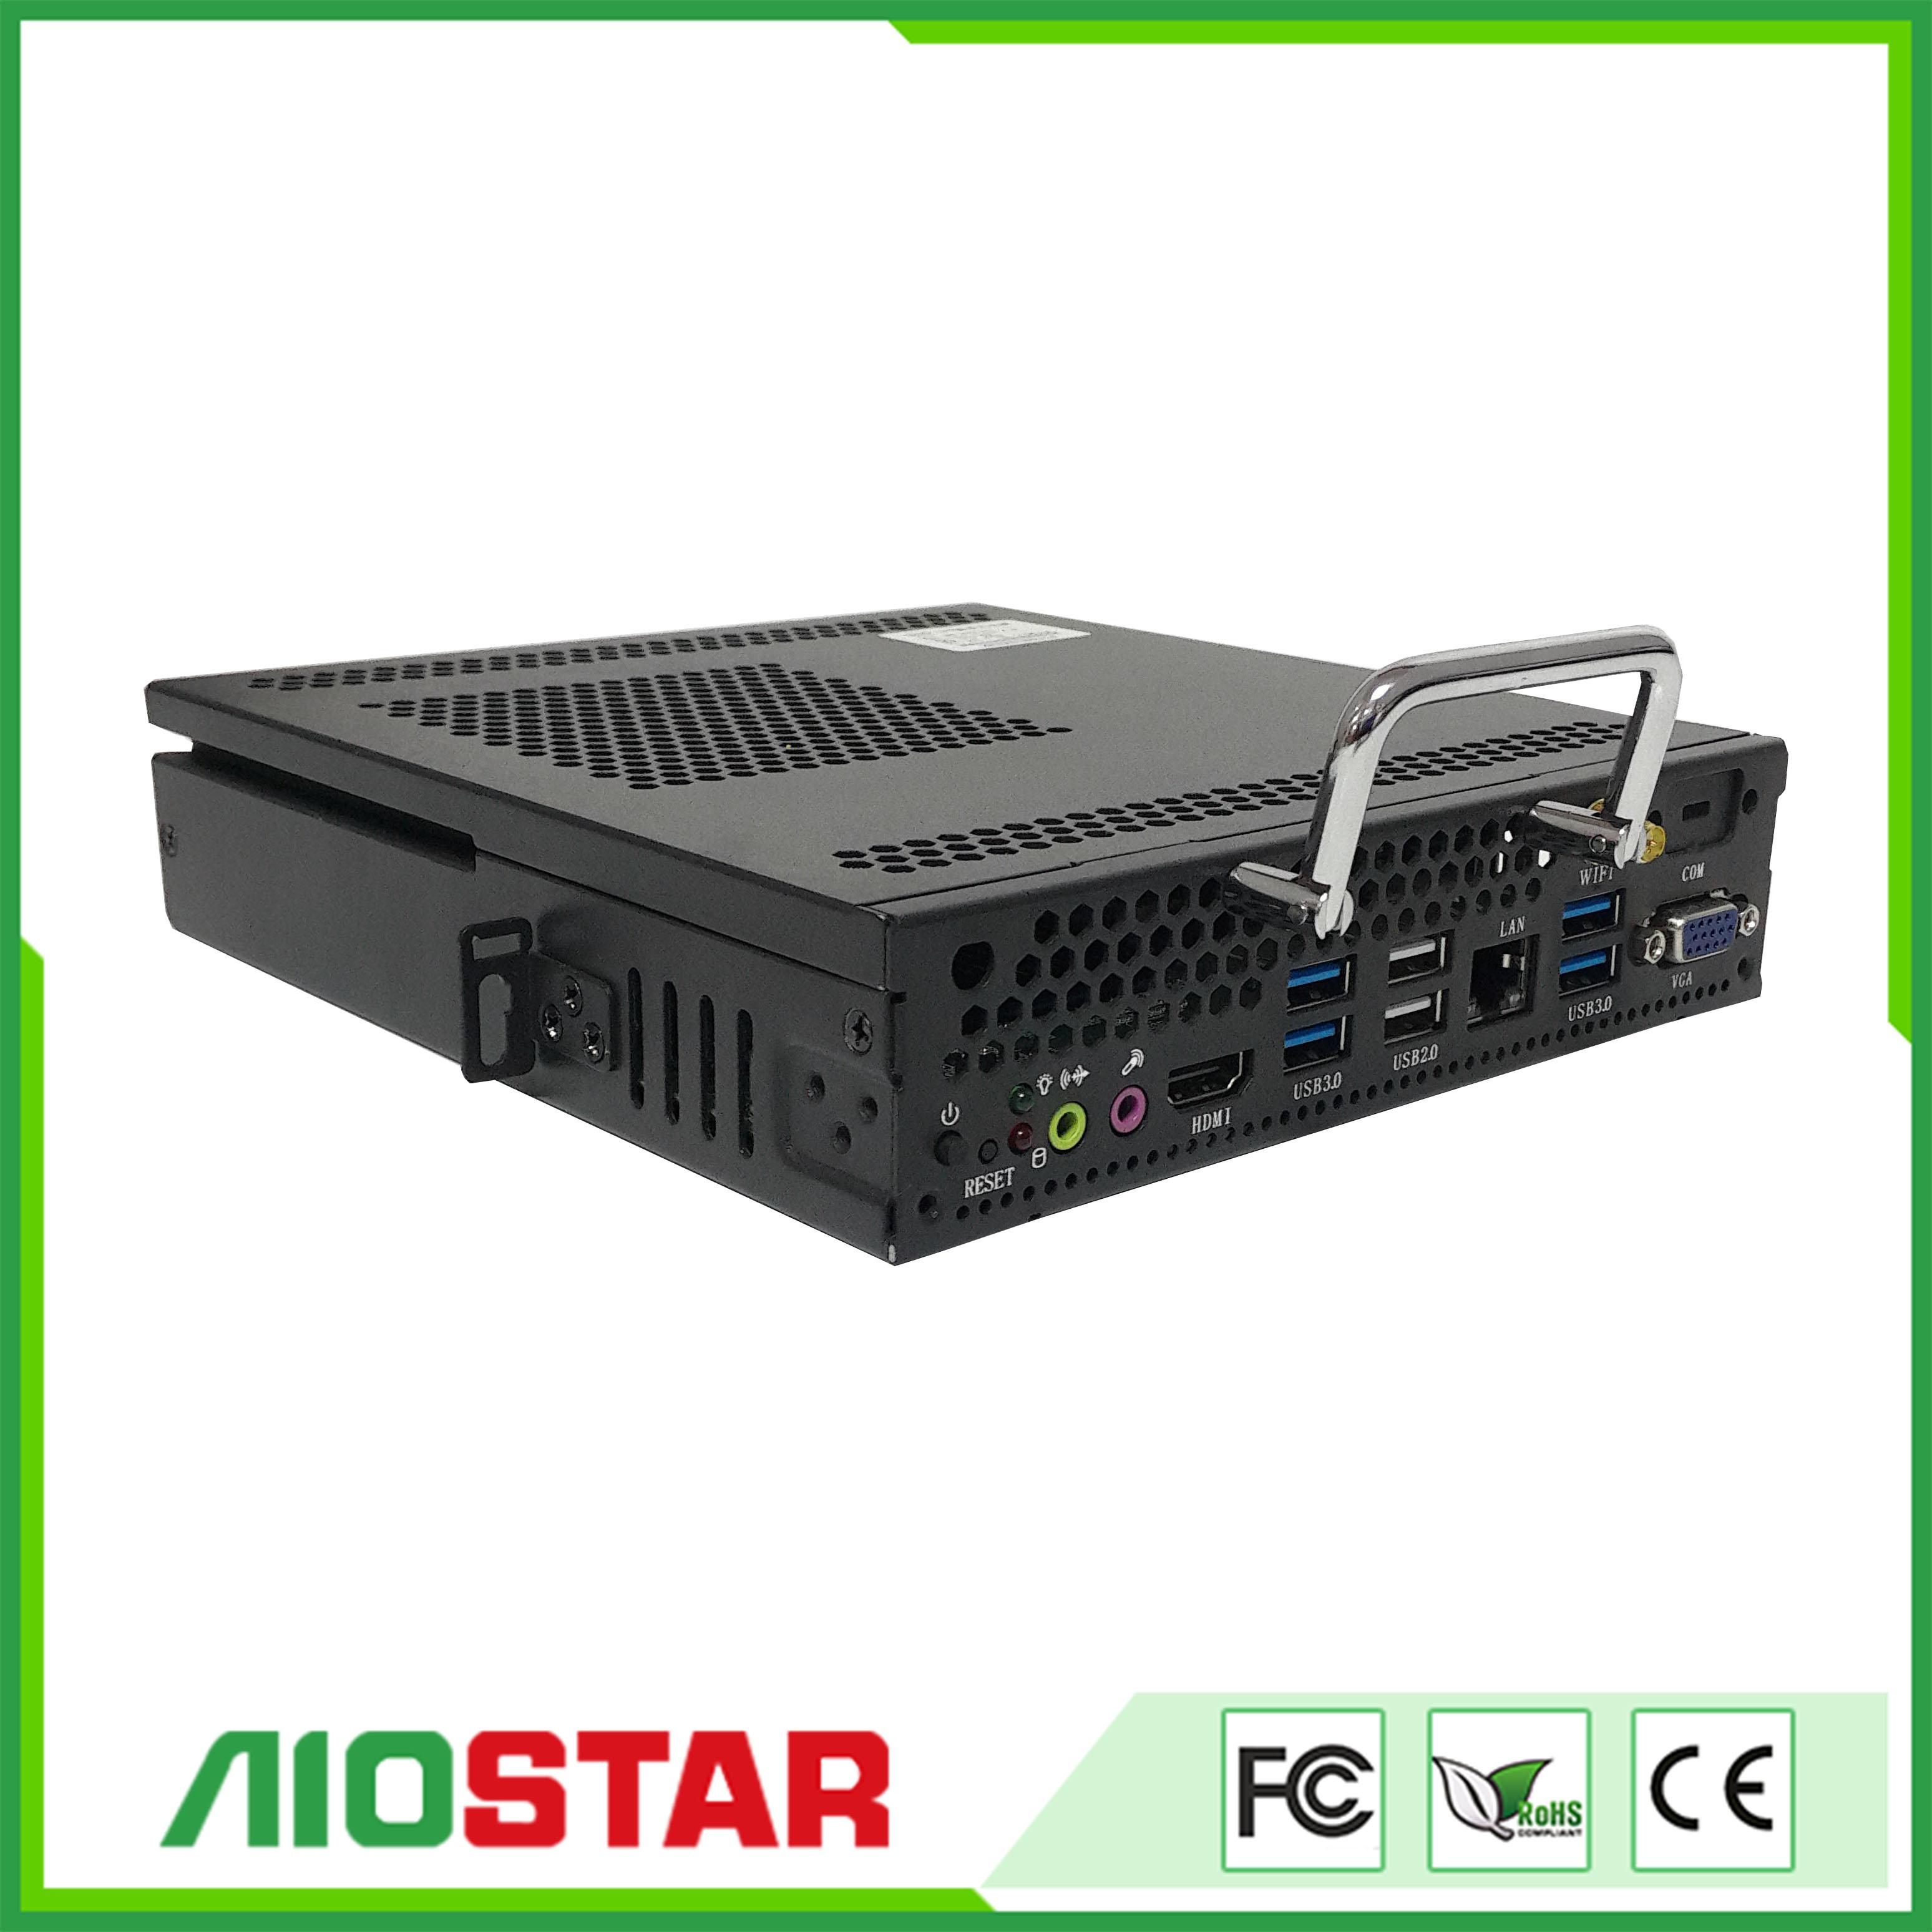 PC Mini computer support Skylake Core1151 LGA I3 I5 I7 CPU